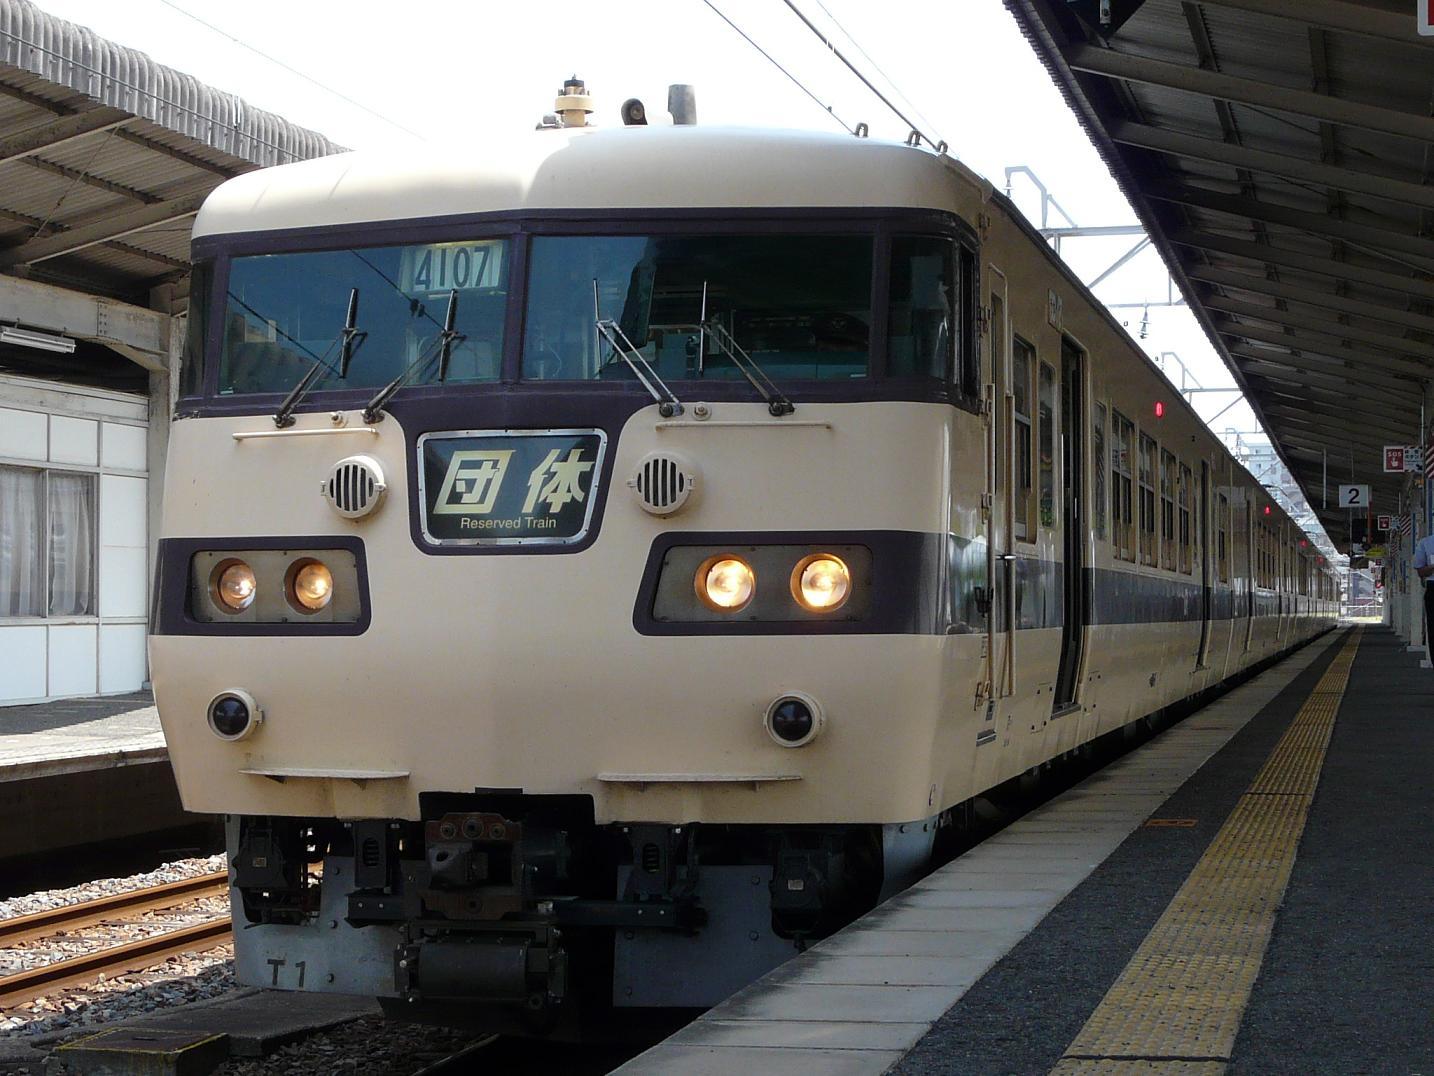 P1190883